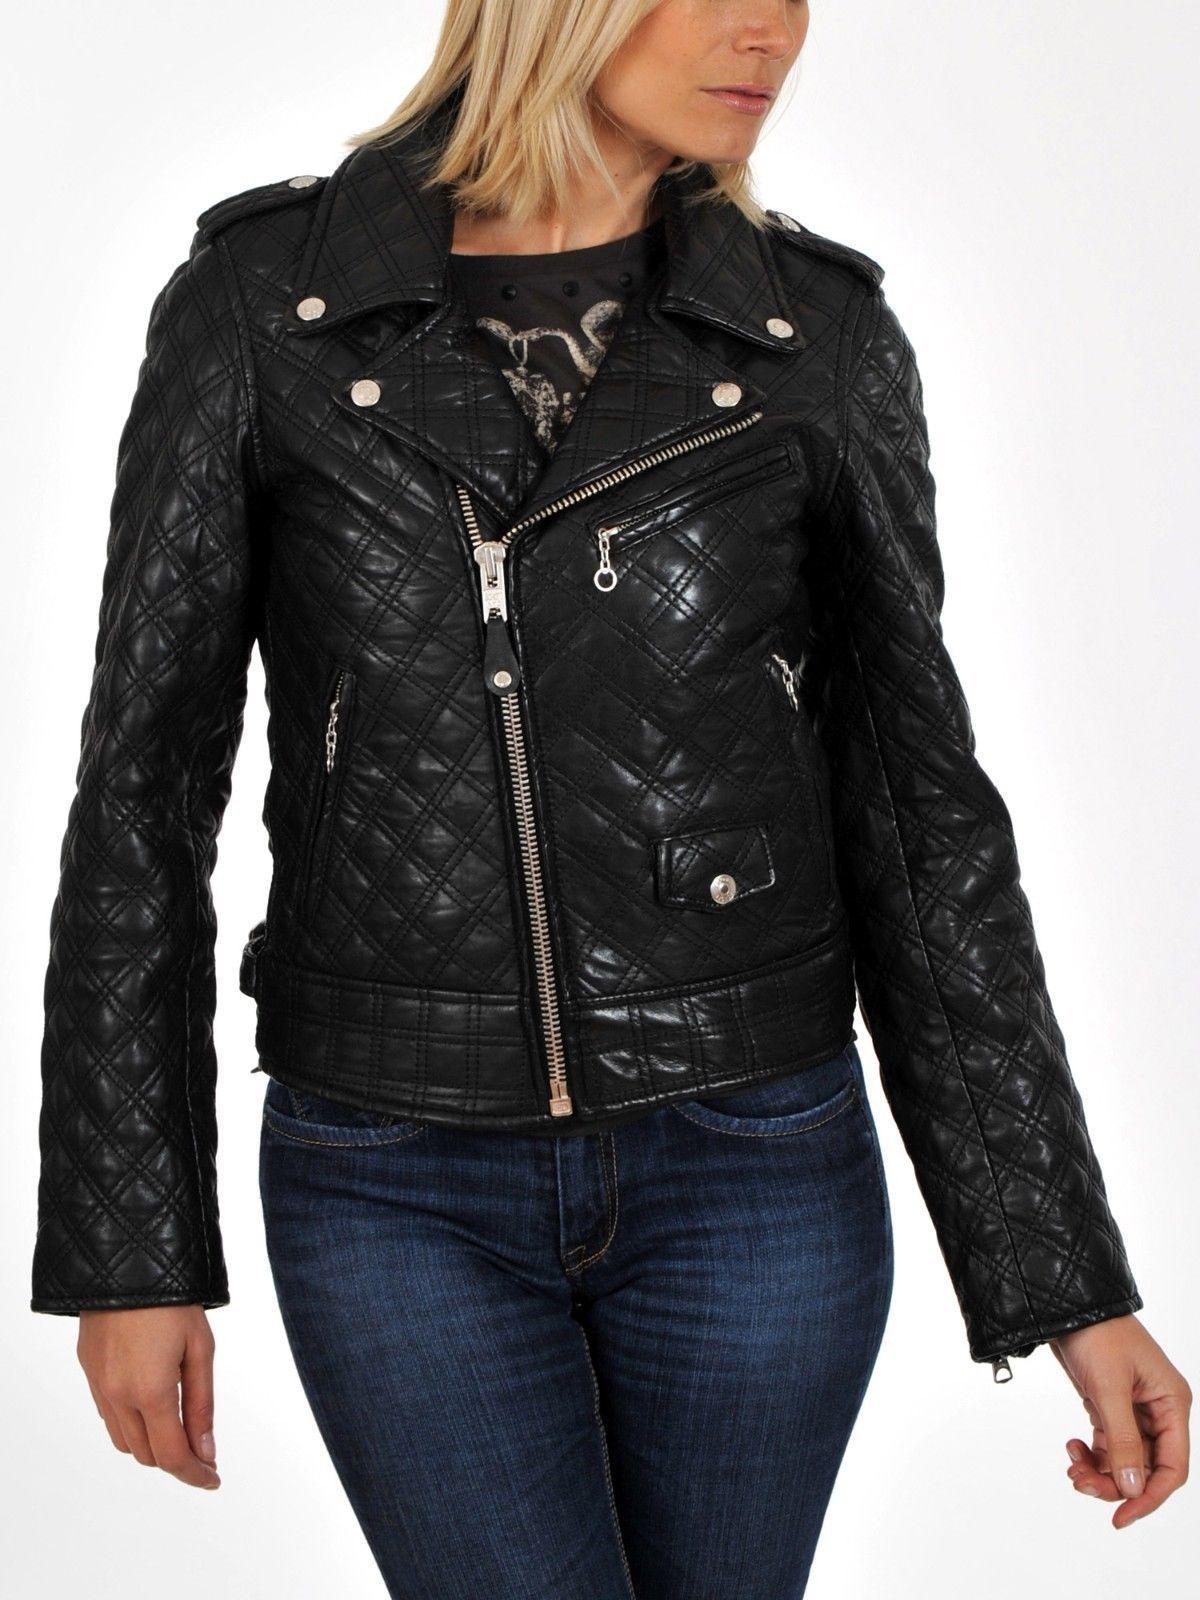 Black Friday Womens Black Soft Lambskin Leather Biker